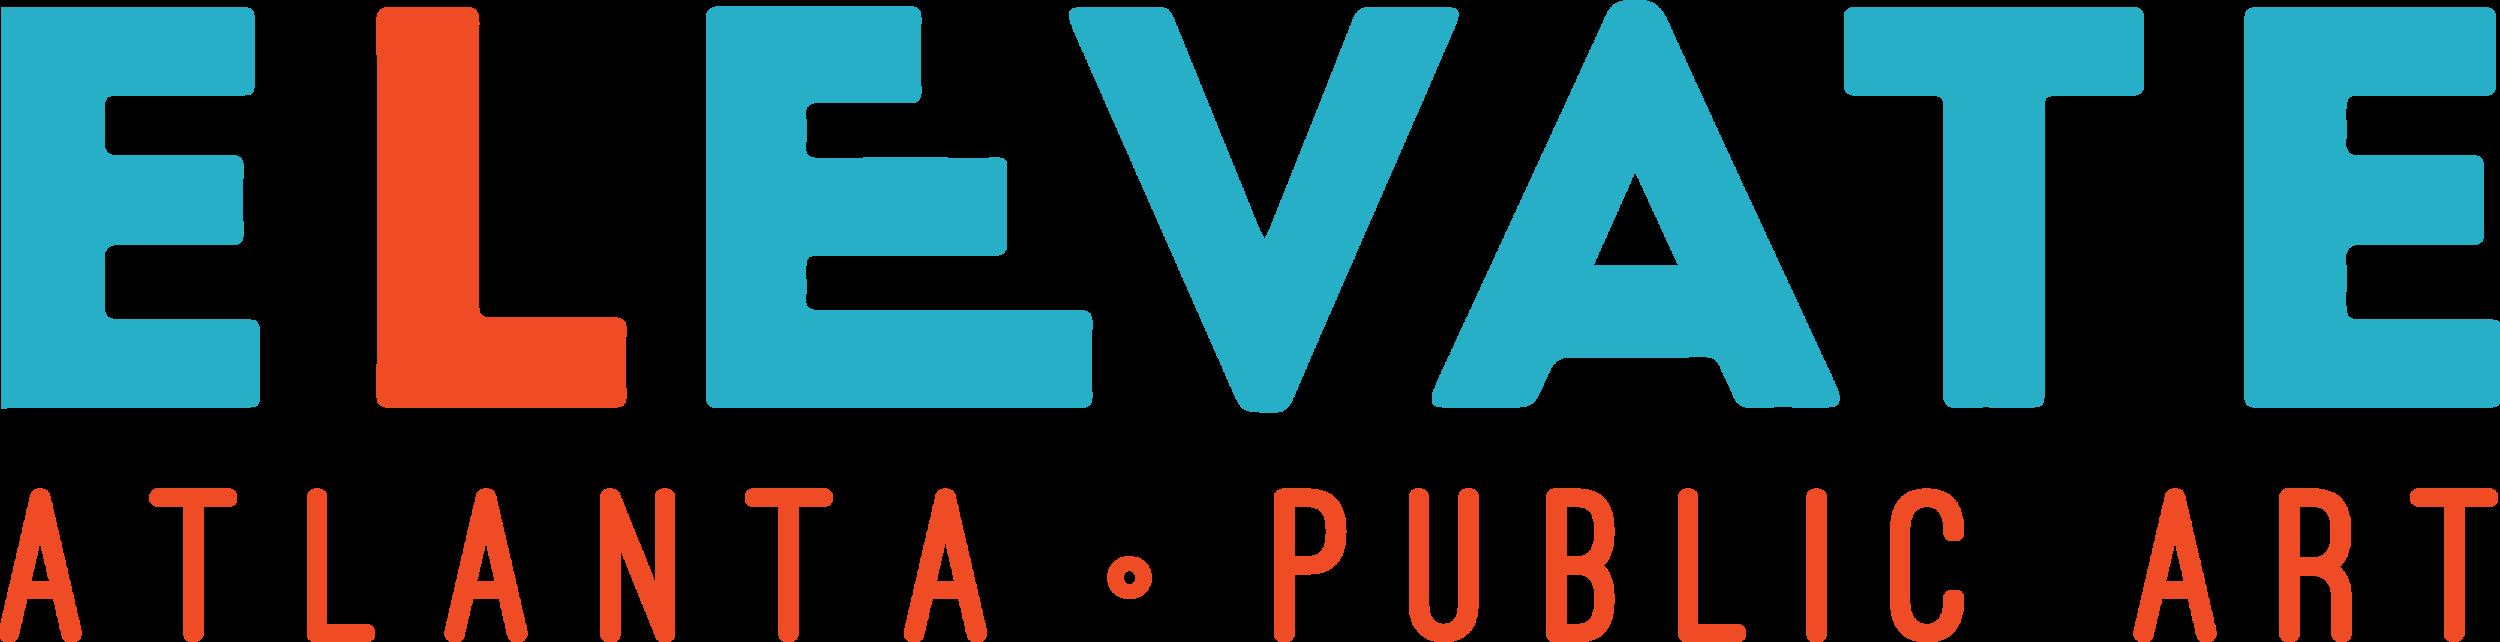 Elevate-wTag-HR.png